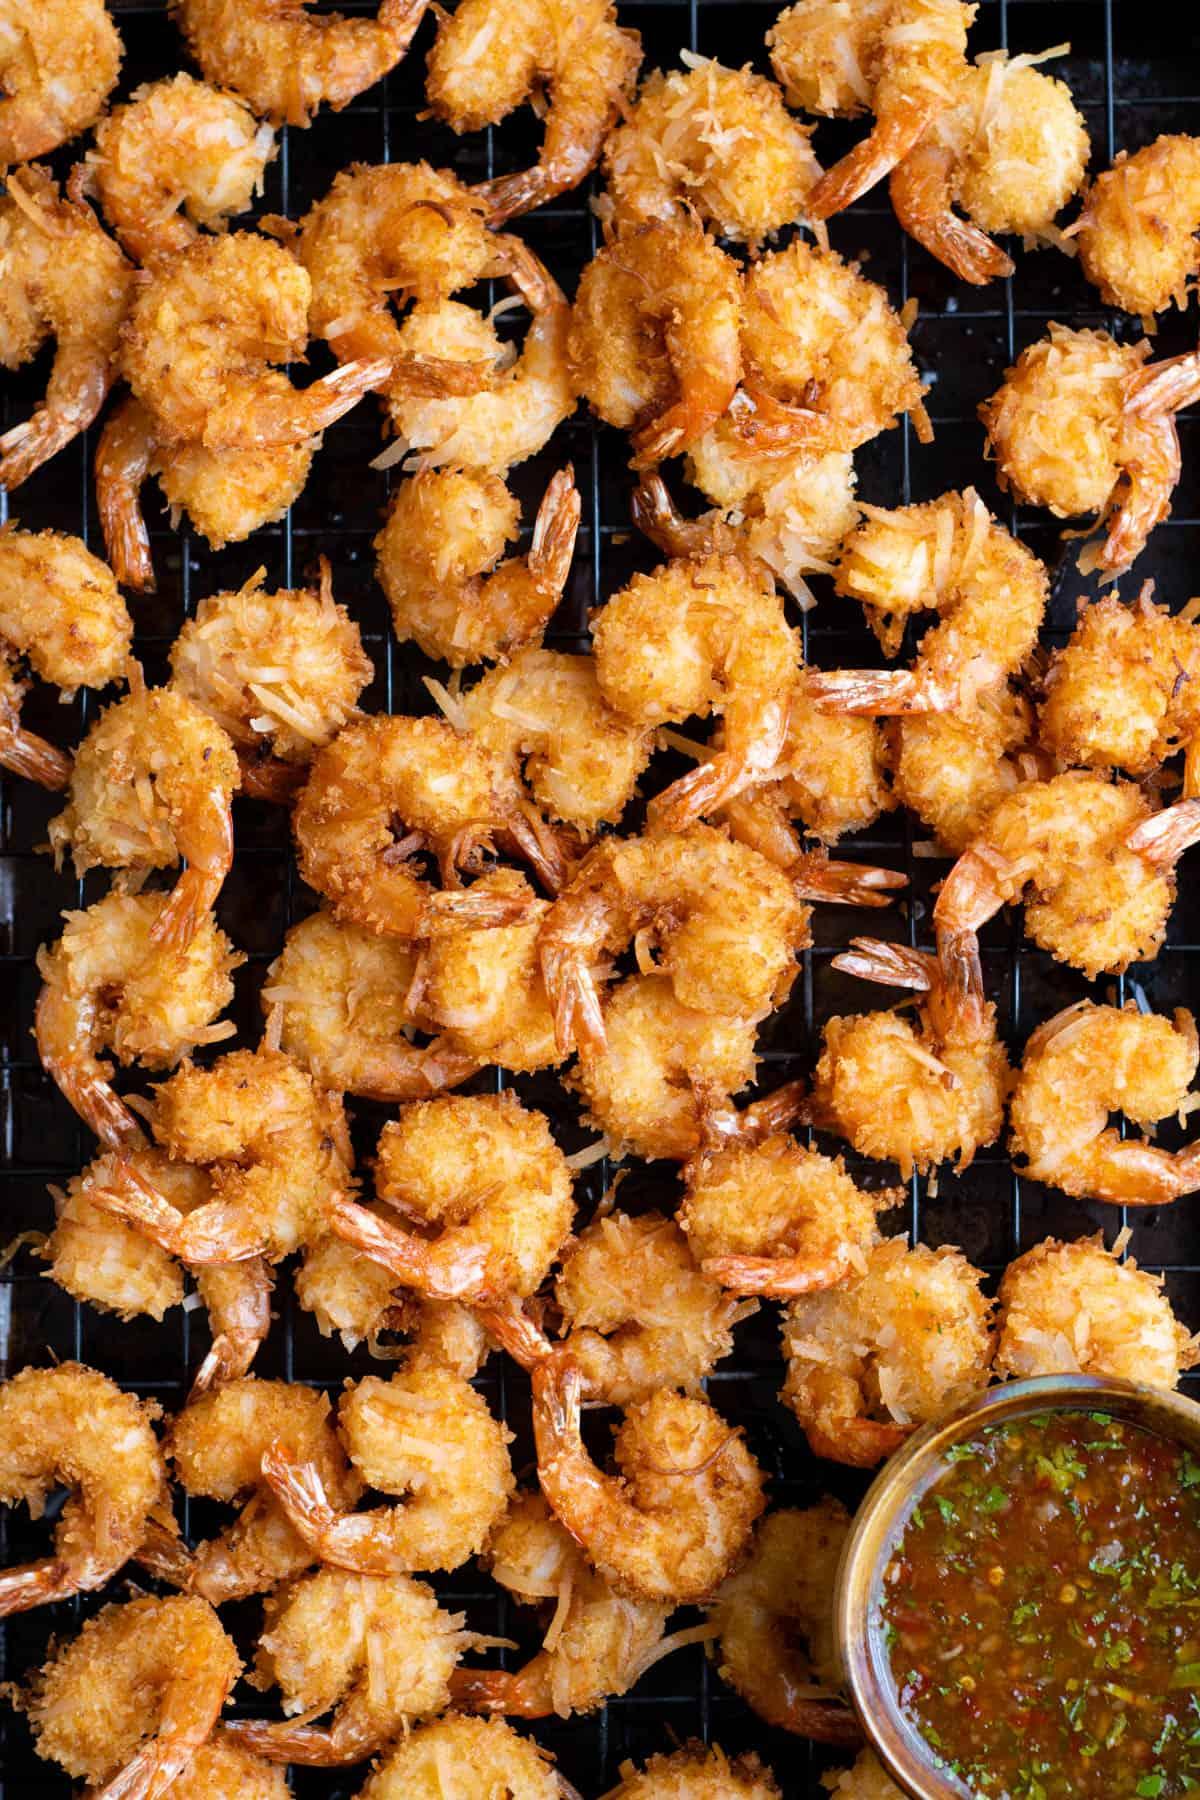 a pan of fried coconut shrimp